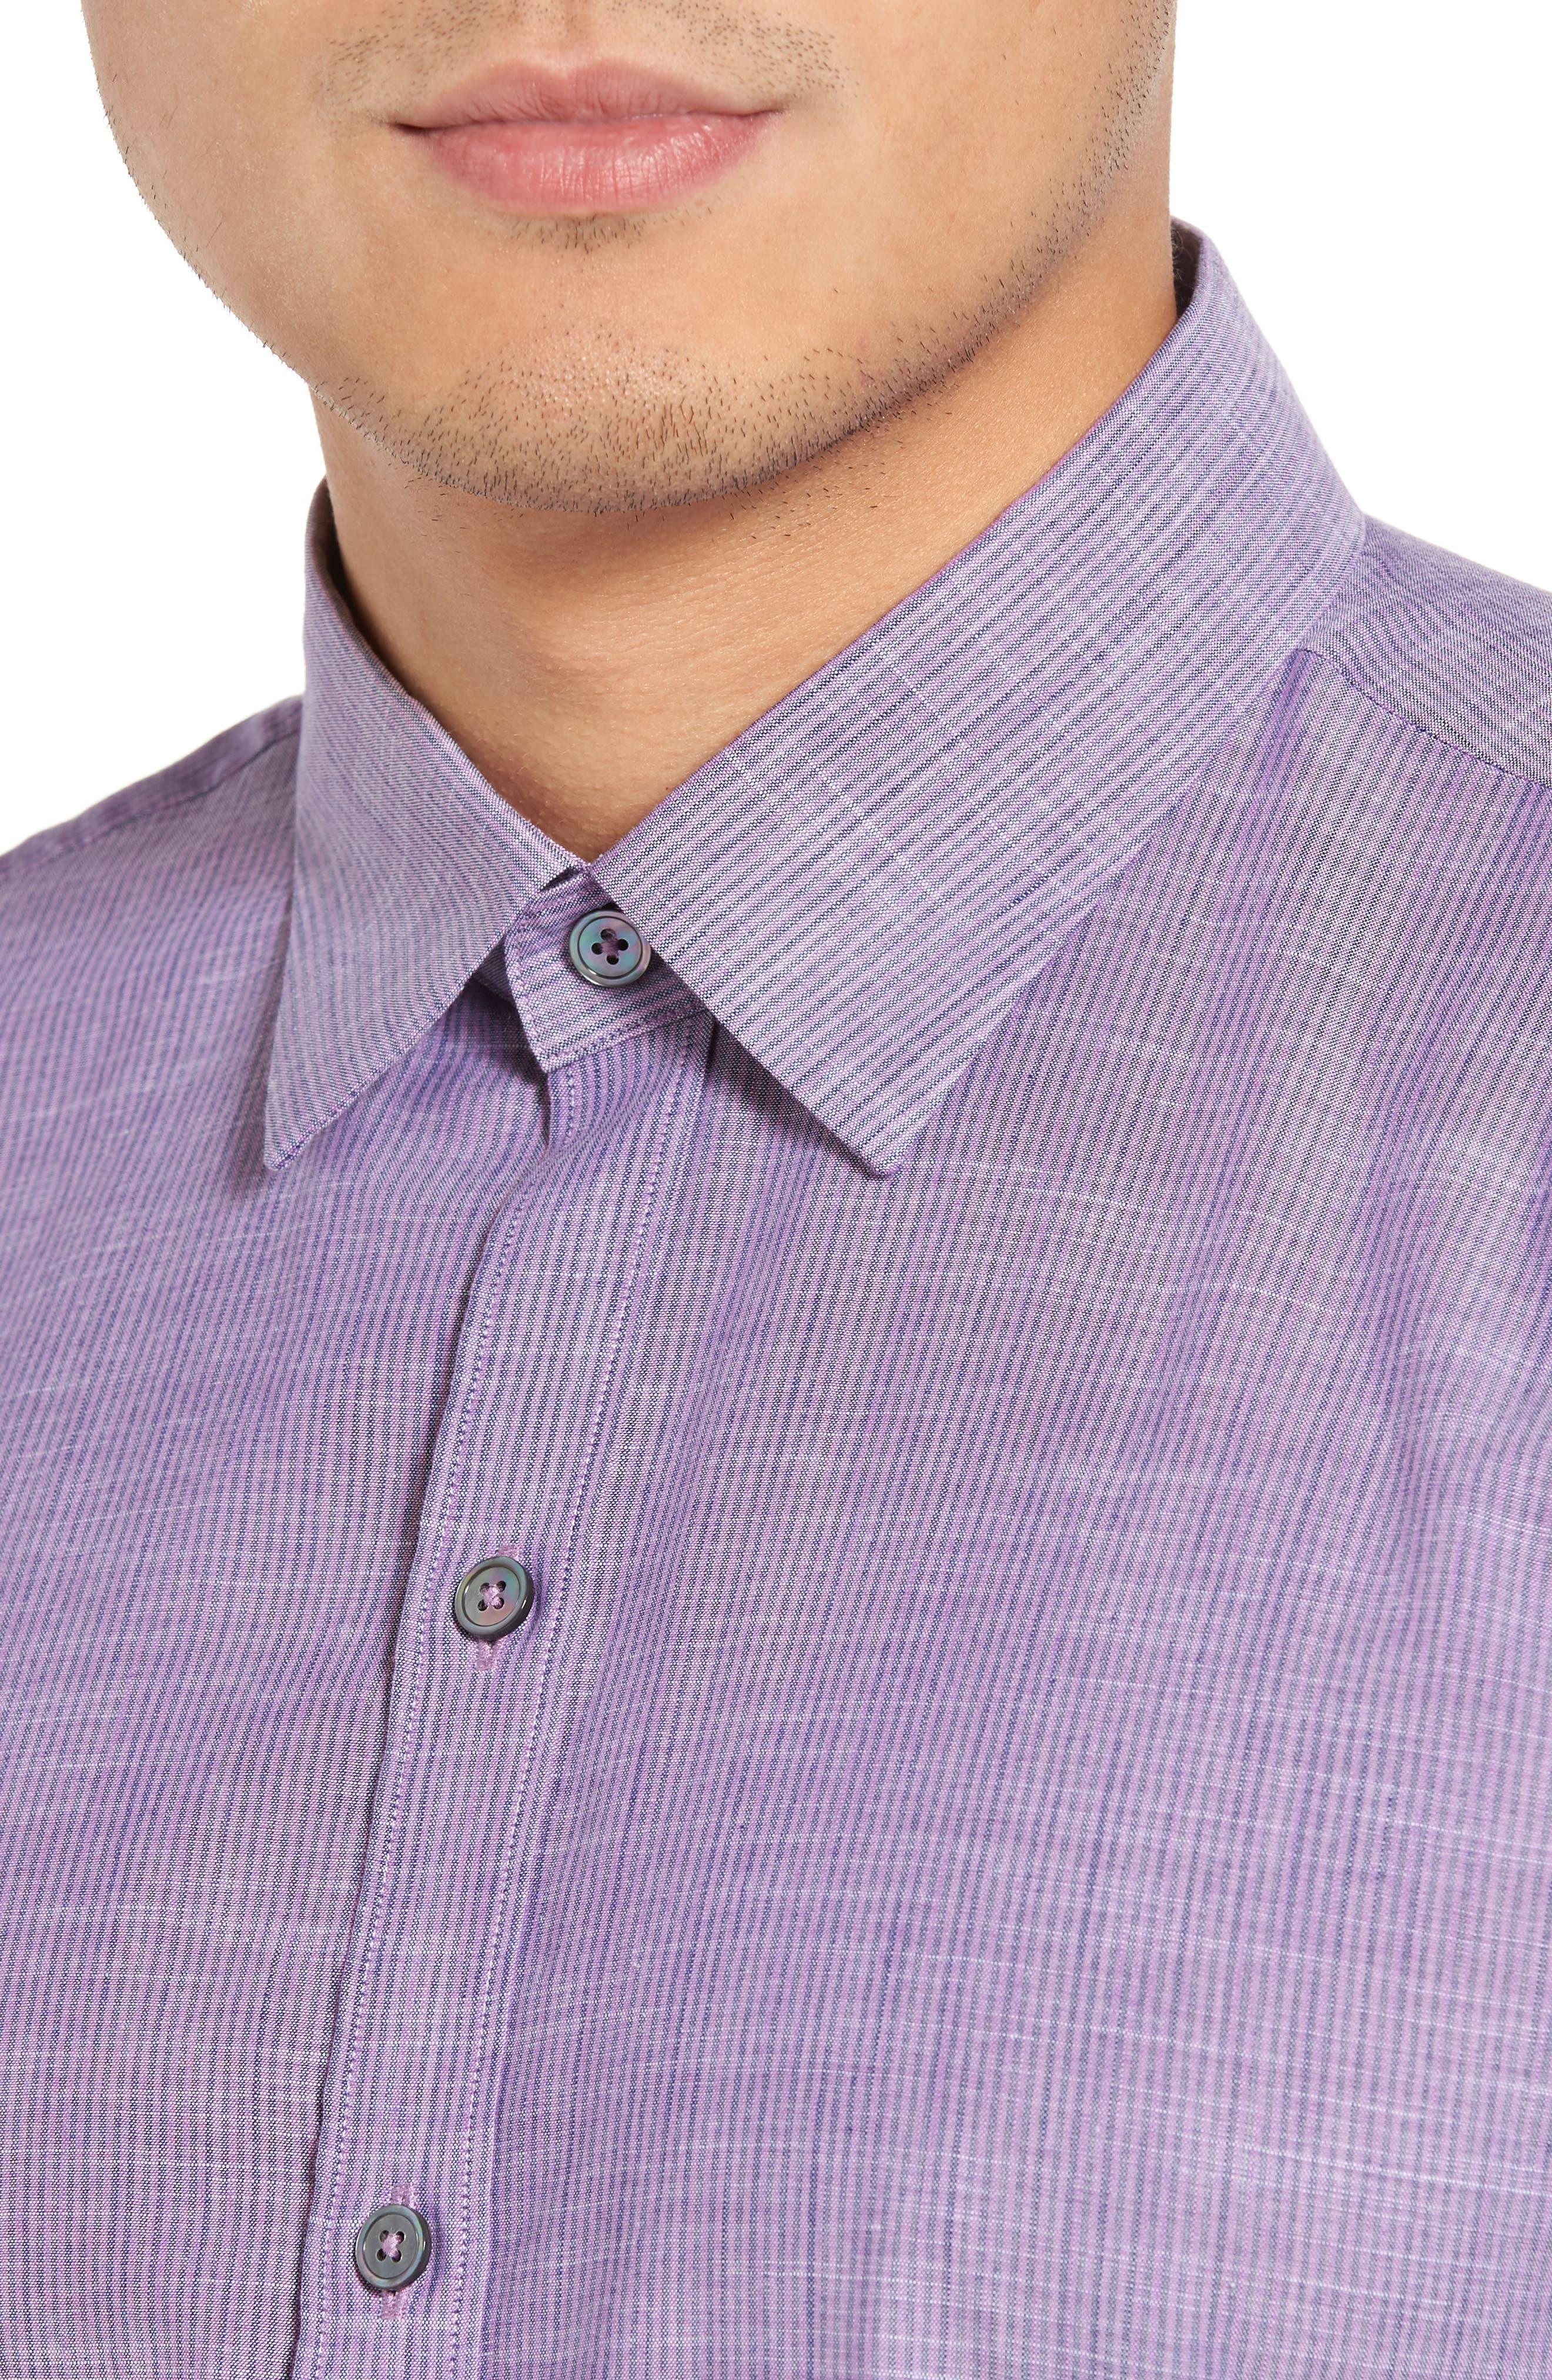 Snower Slim Fit Sport Shirt,                             Alternate thumbnail 4, color,                             500